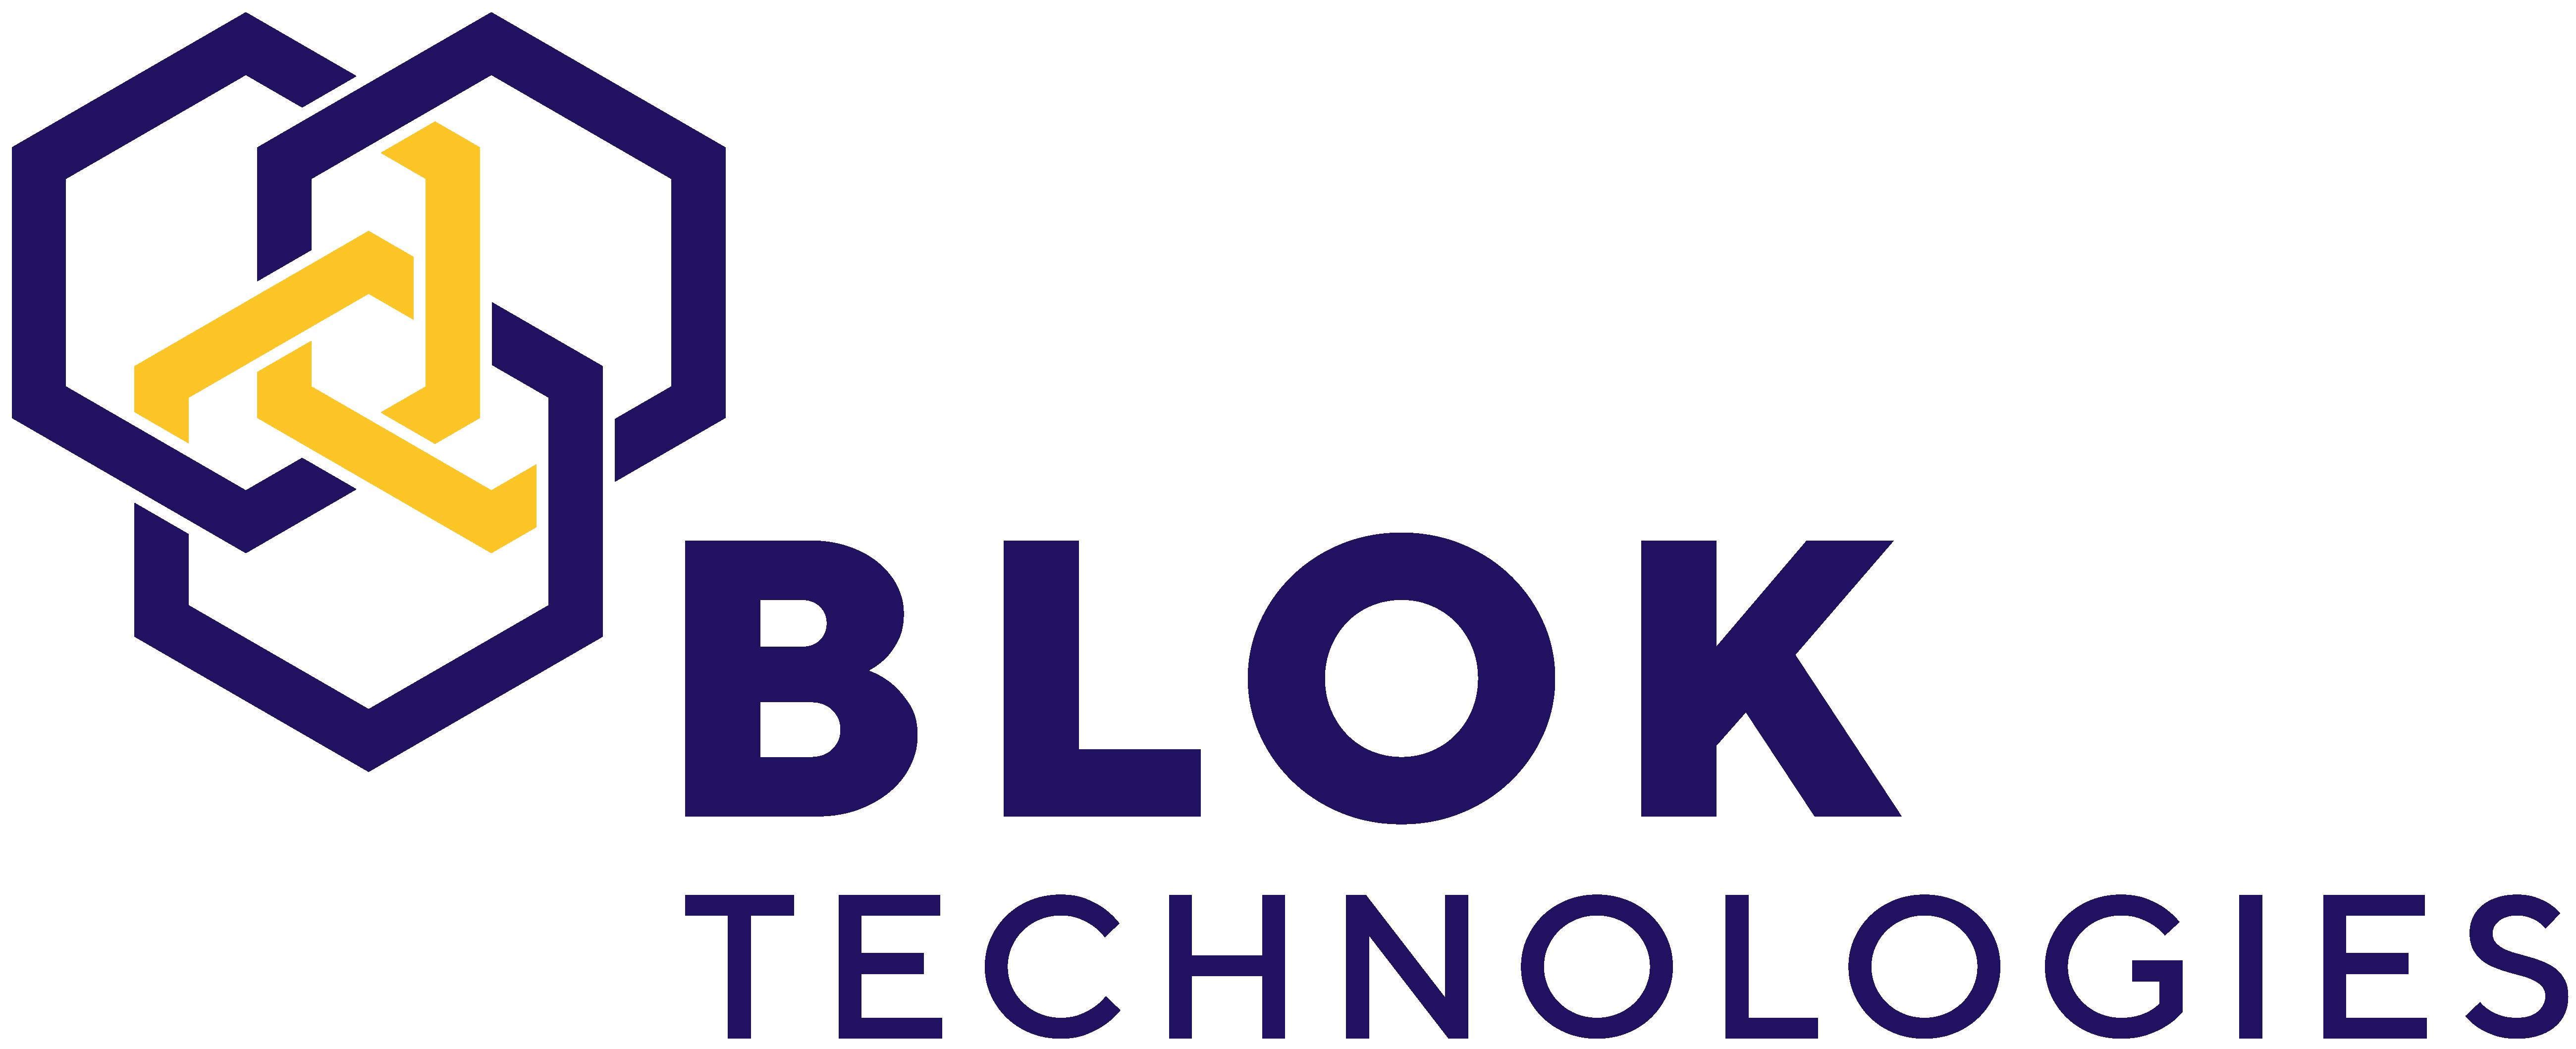 BLOK Technologies Provides 2020 Corporate Update